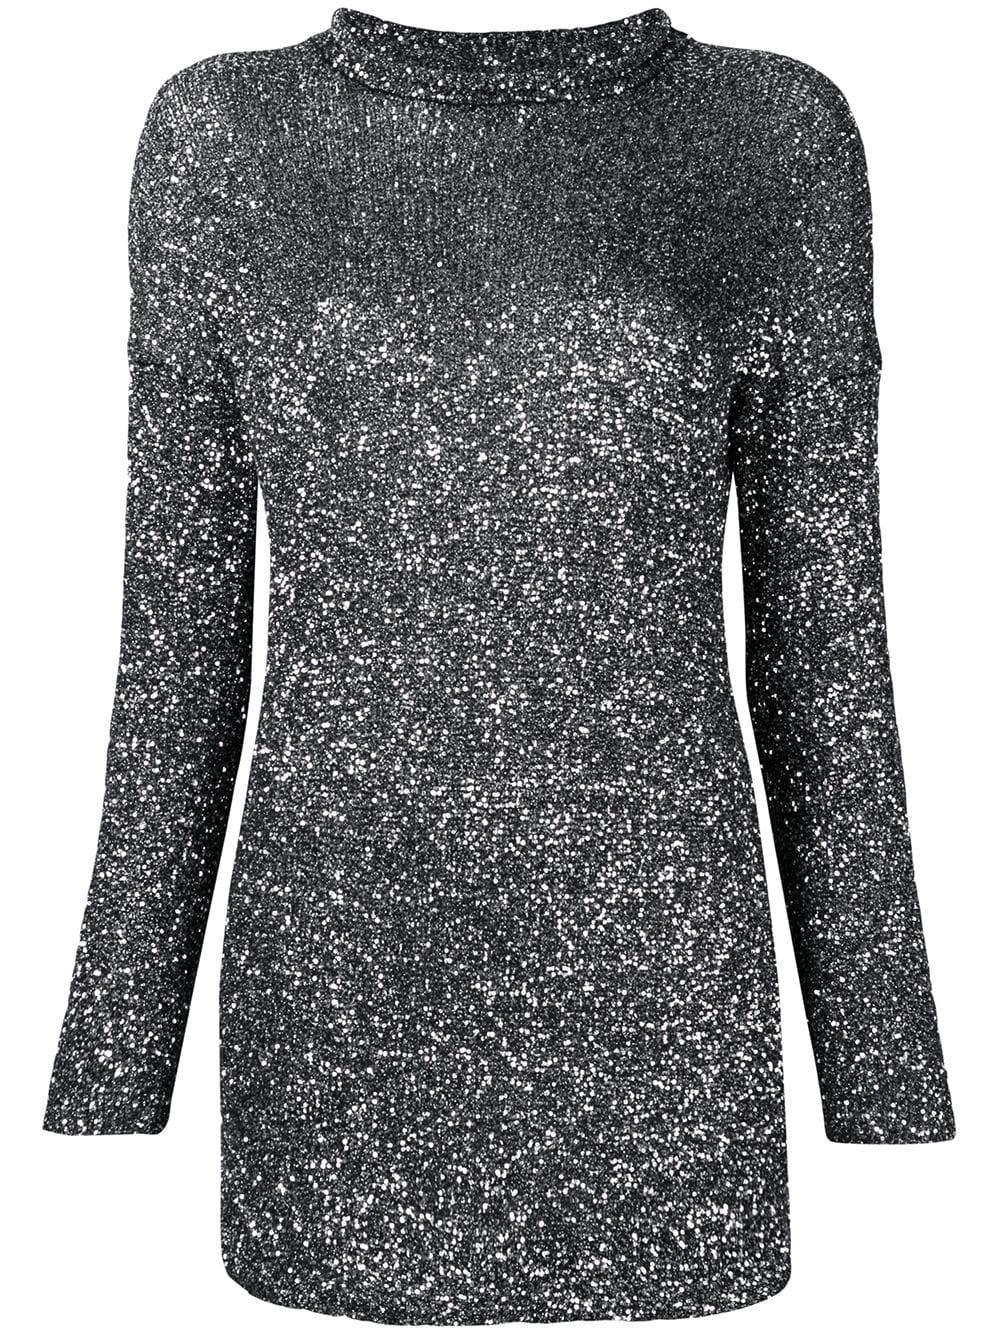 2b6be5c1dda Saint Laurent - Black & Silver Crystal Mesh Mini Dress   Mitchell Stores